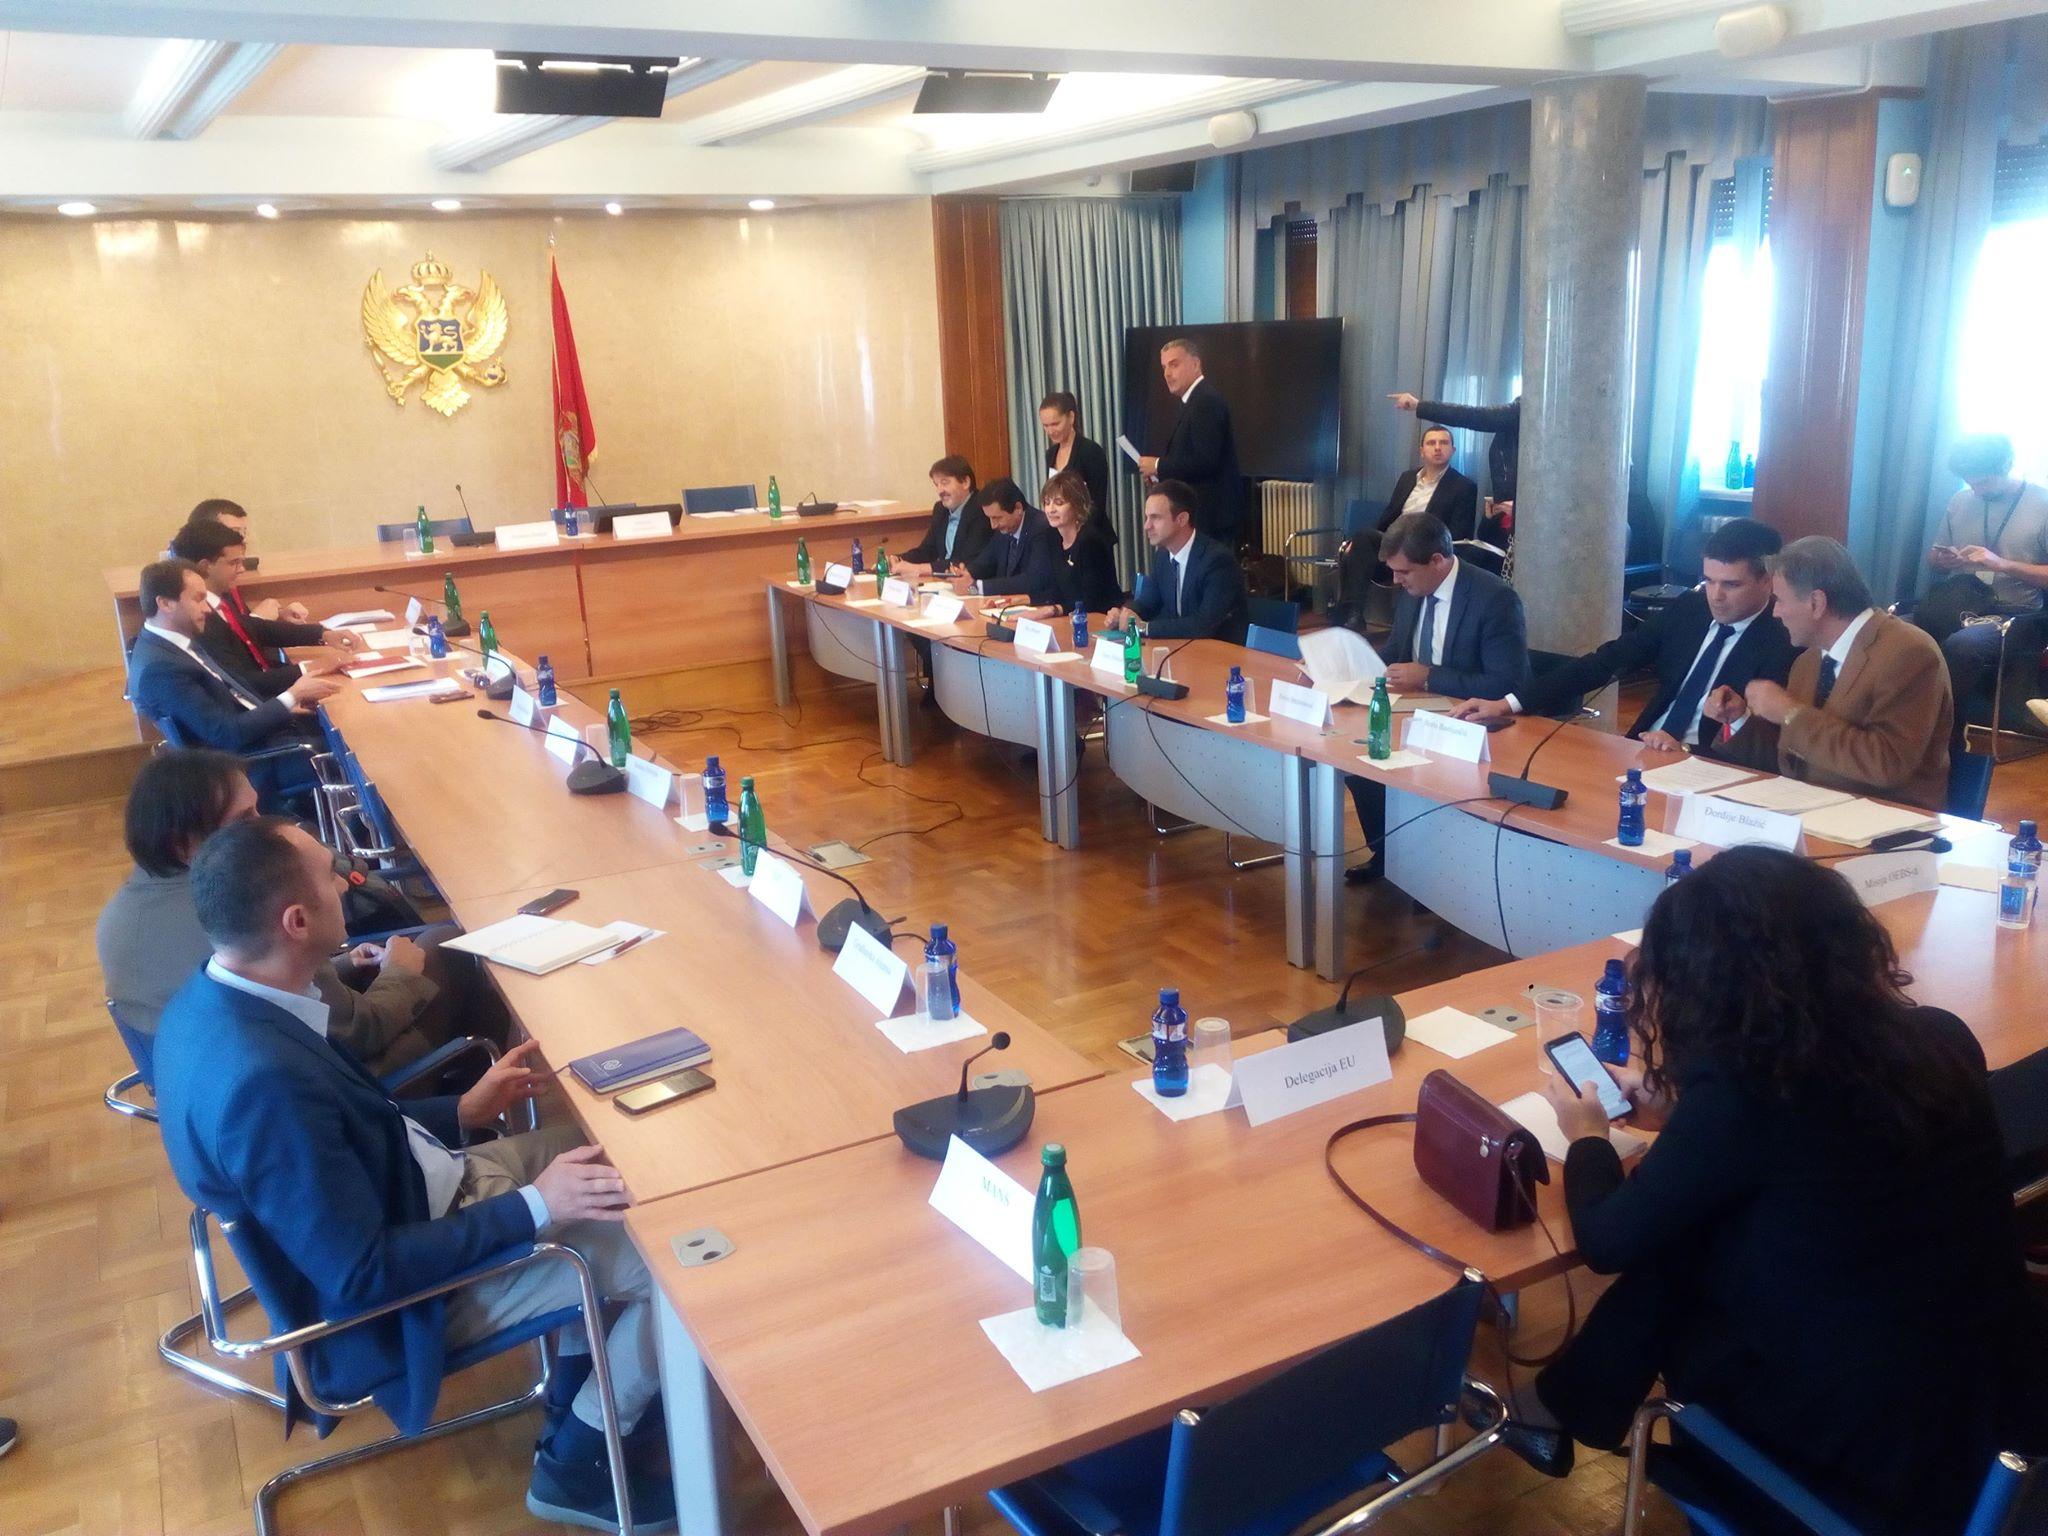 Odbor za izborne reforme: Do 22. oktobra prvi nacrti zakona, za usvajanje odluka 11 od 14 glasova